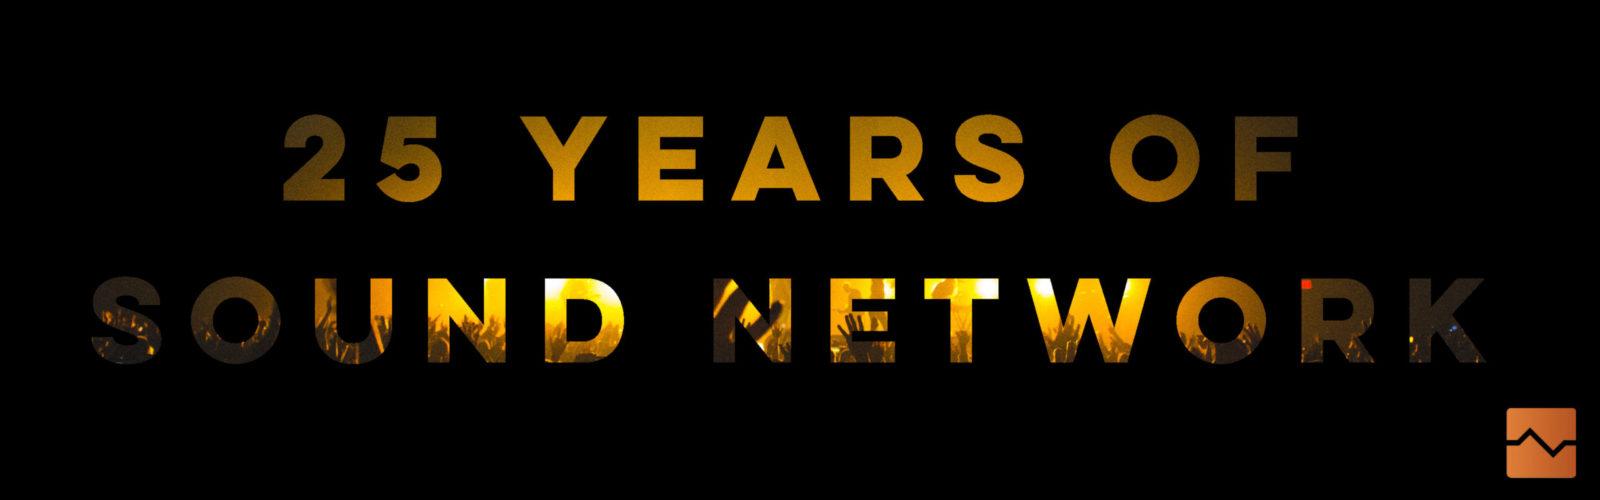 25 years website image